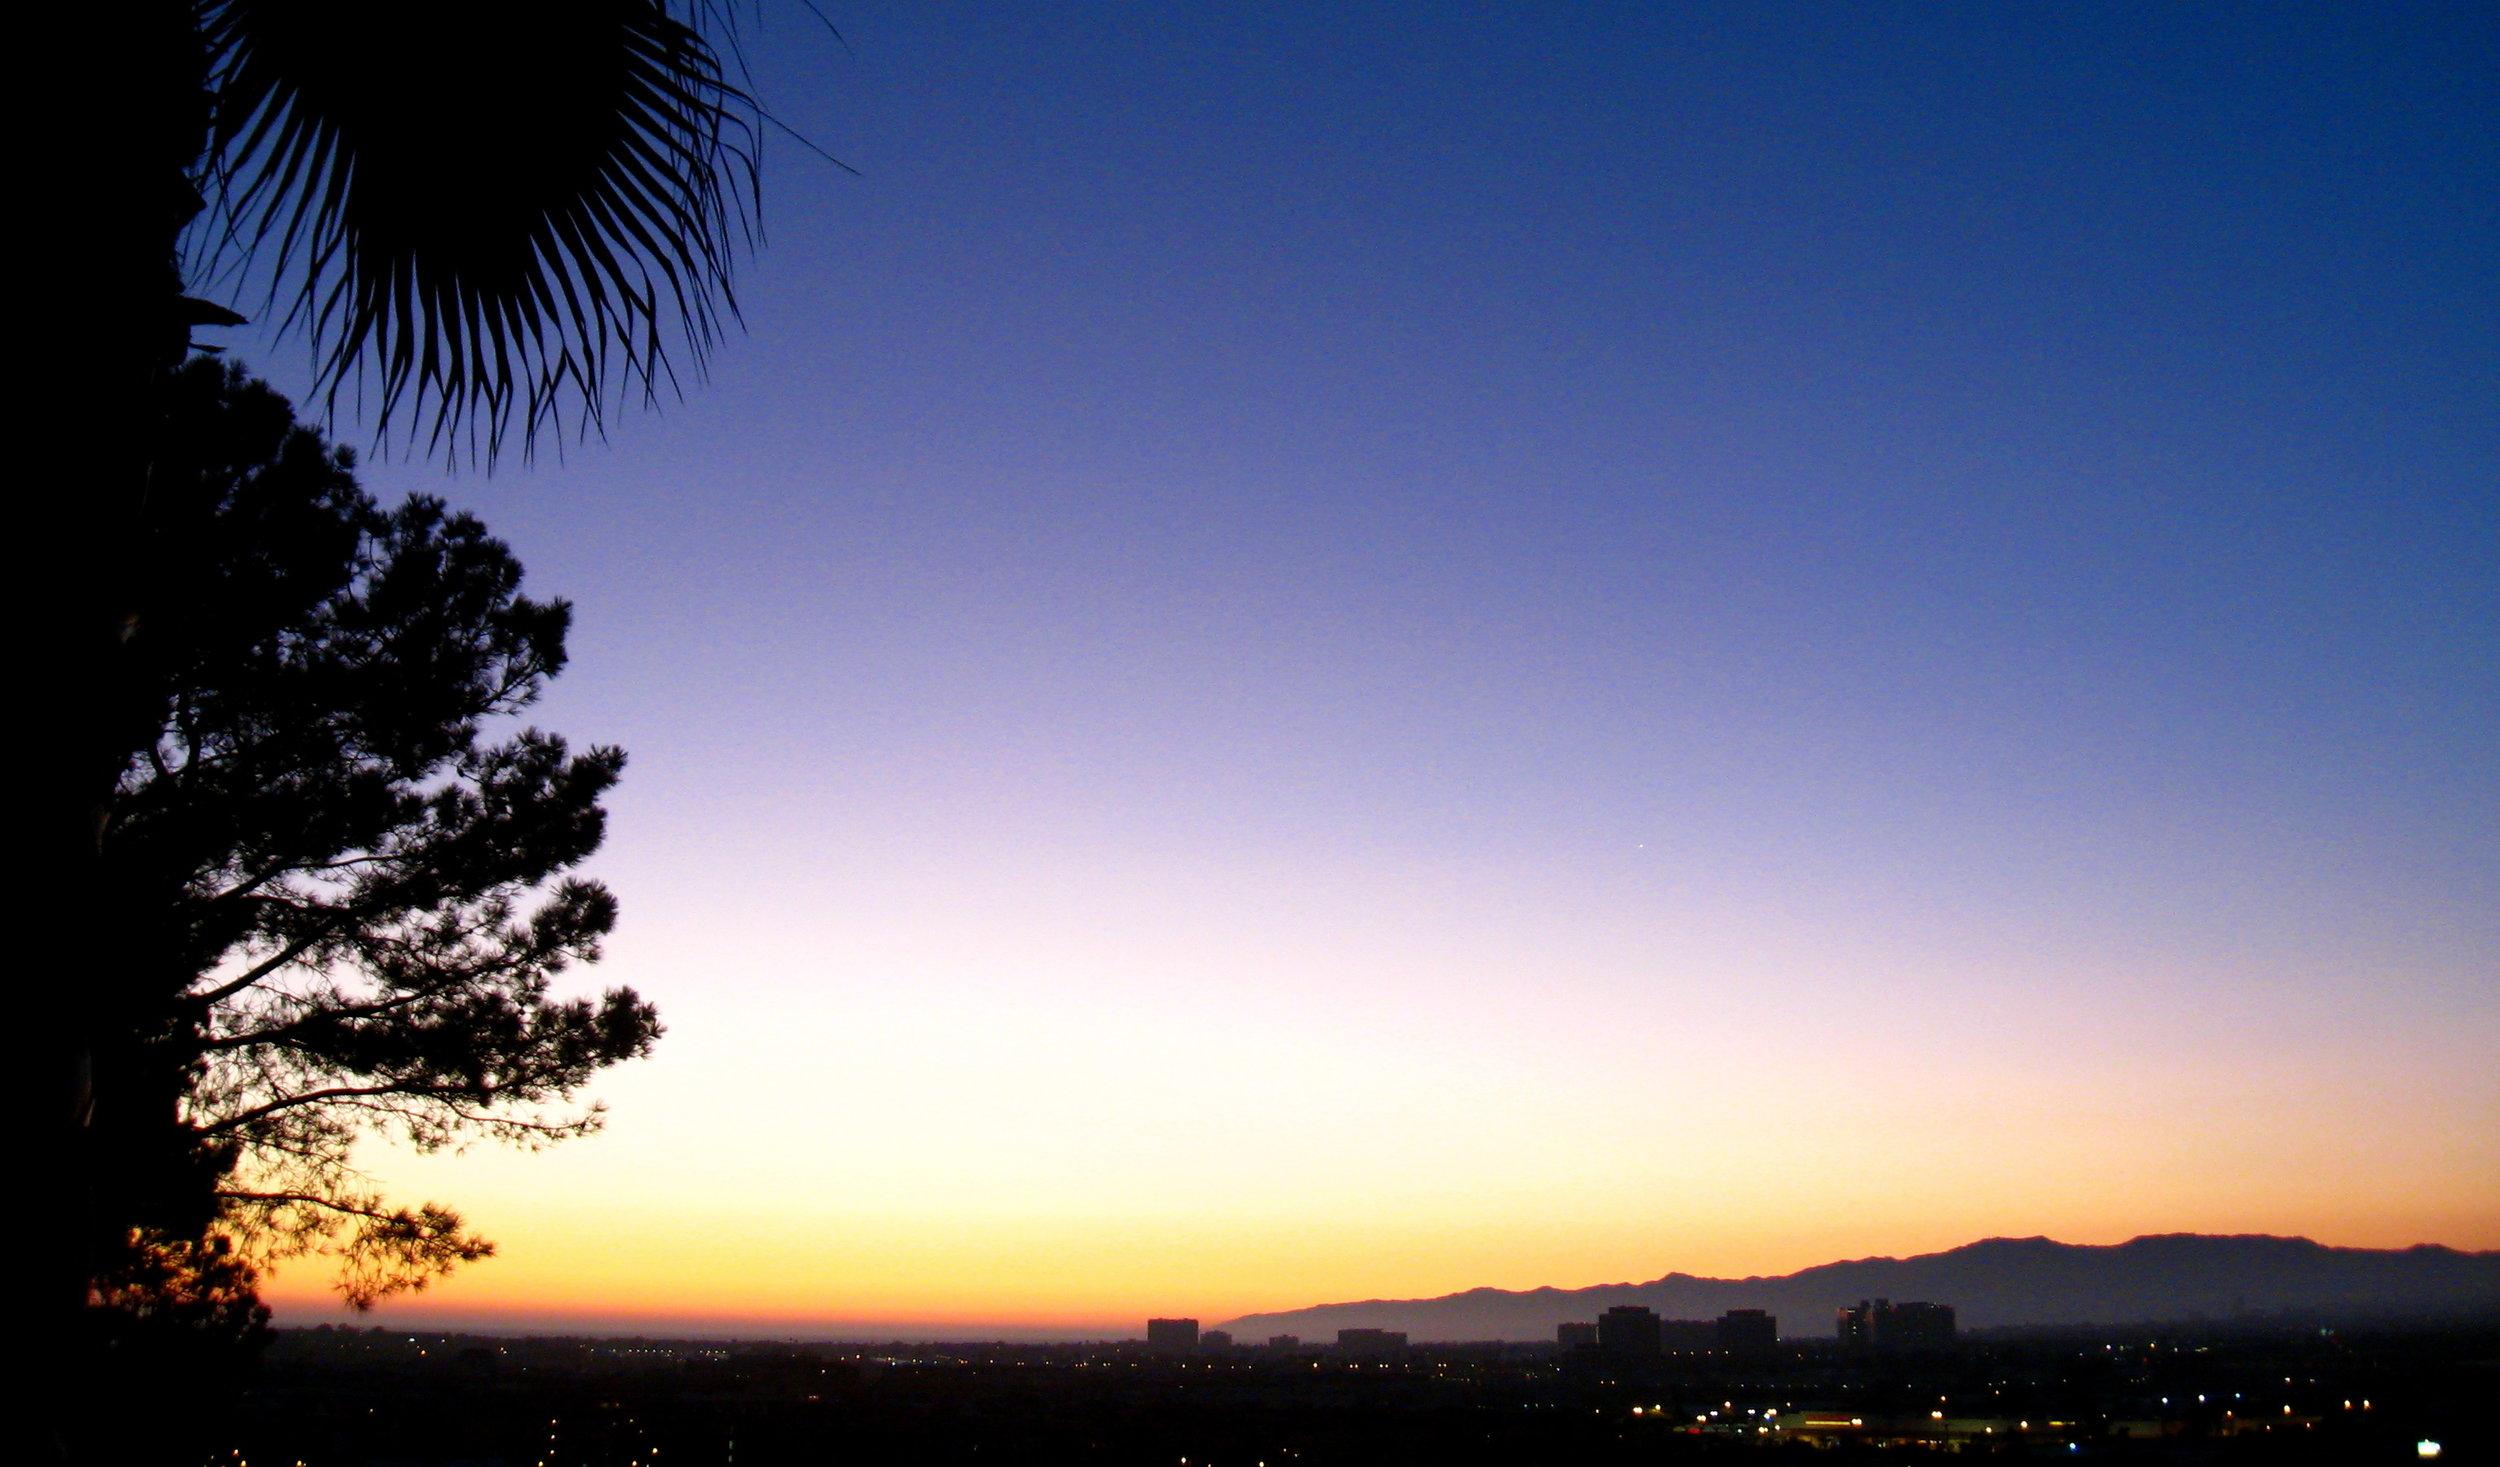 Matt's gorgeous sunset view at the edge of LMU bluff.